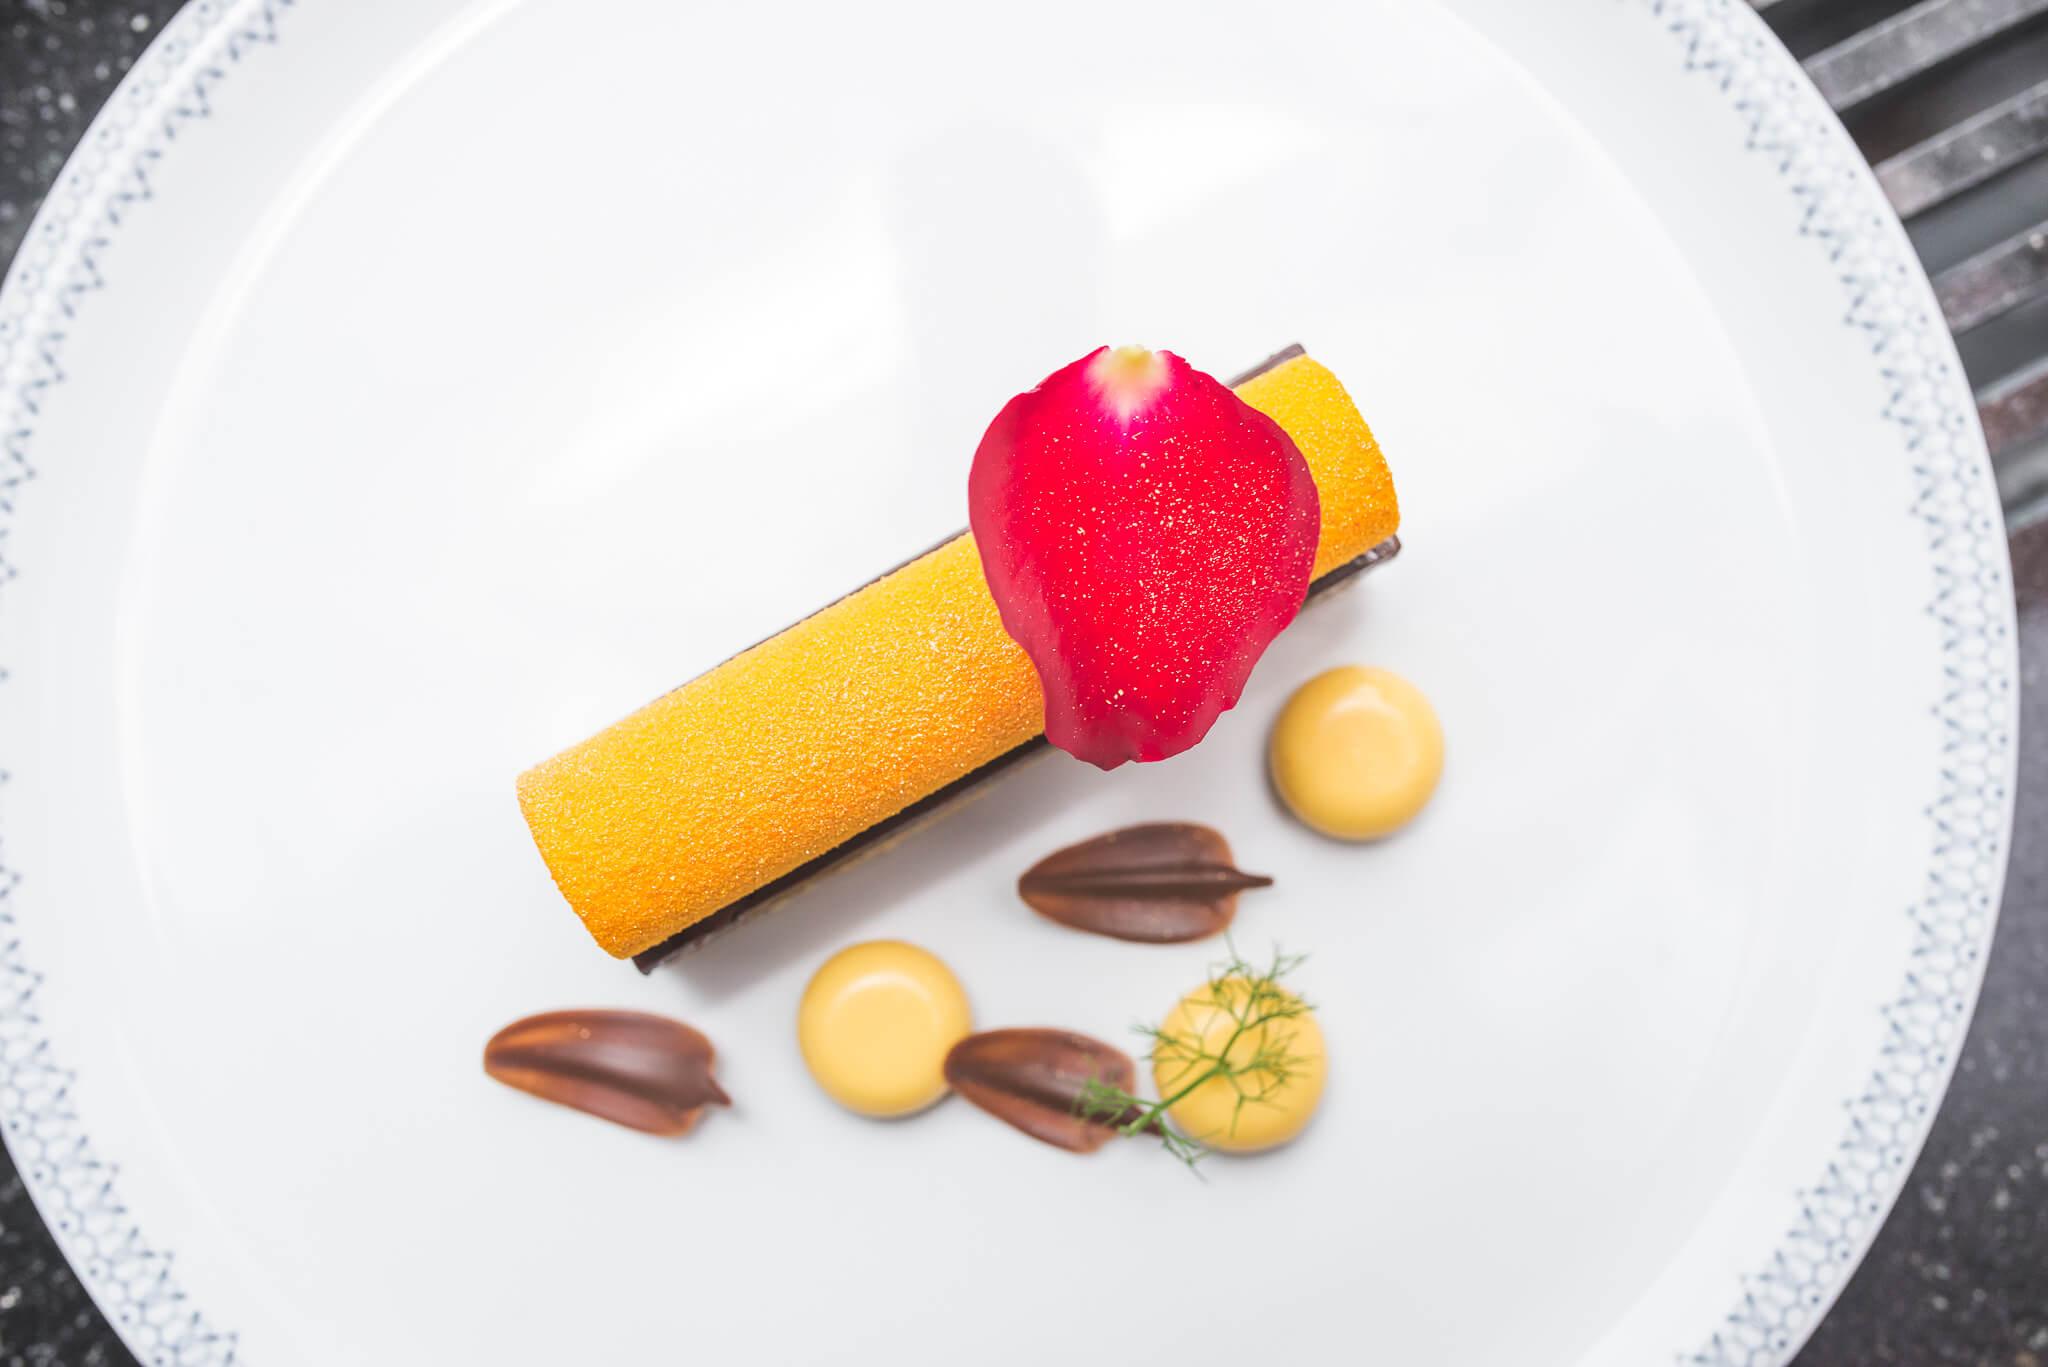 polskiesmaki3 1 - Top 6 ideas for a romantic Valentine's Day dinner